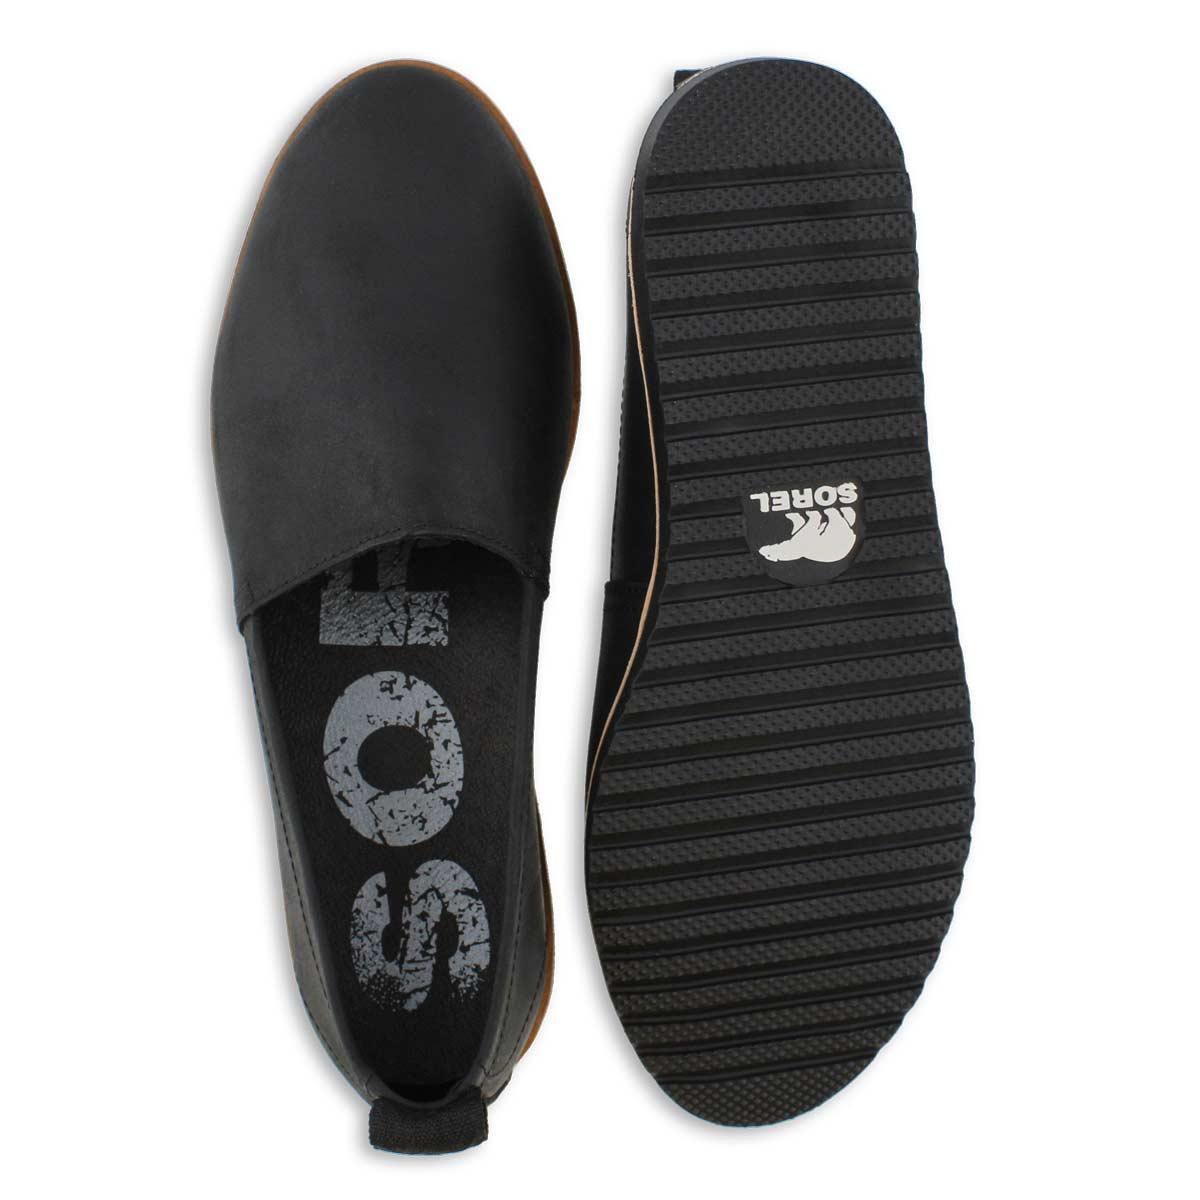 Lds Ella black casual slip on shoe